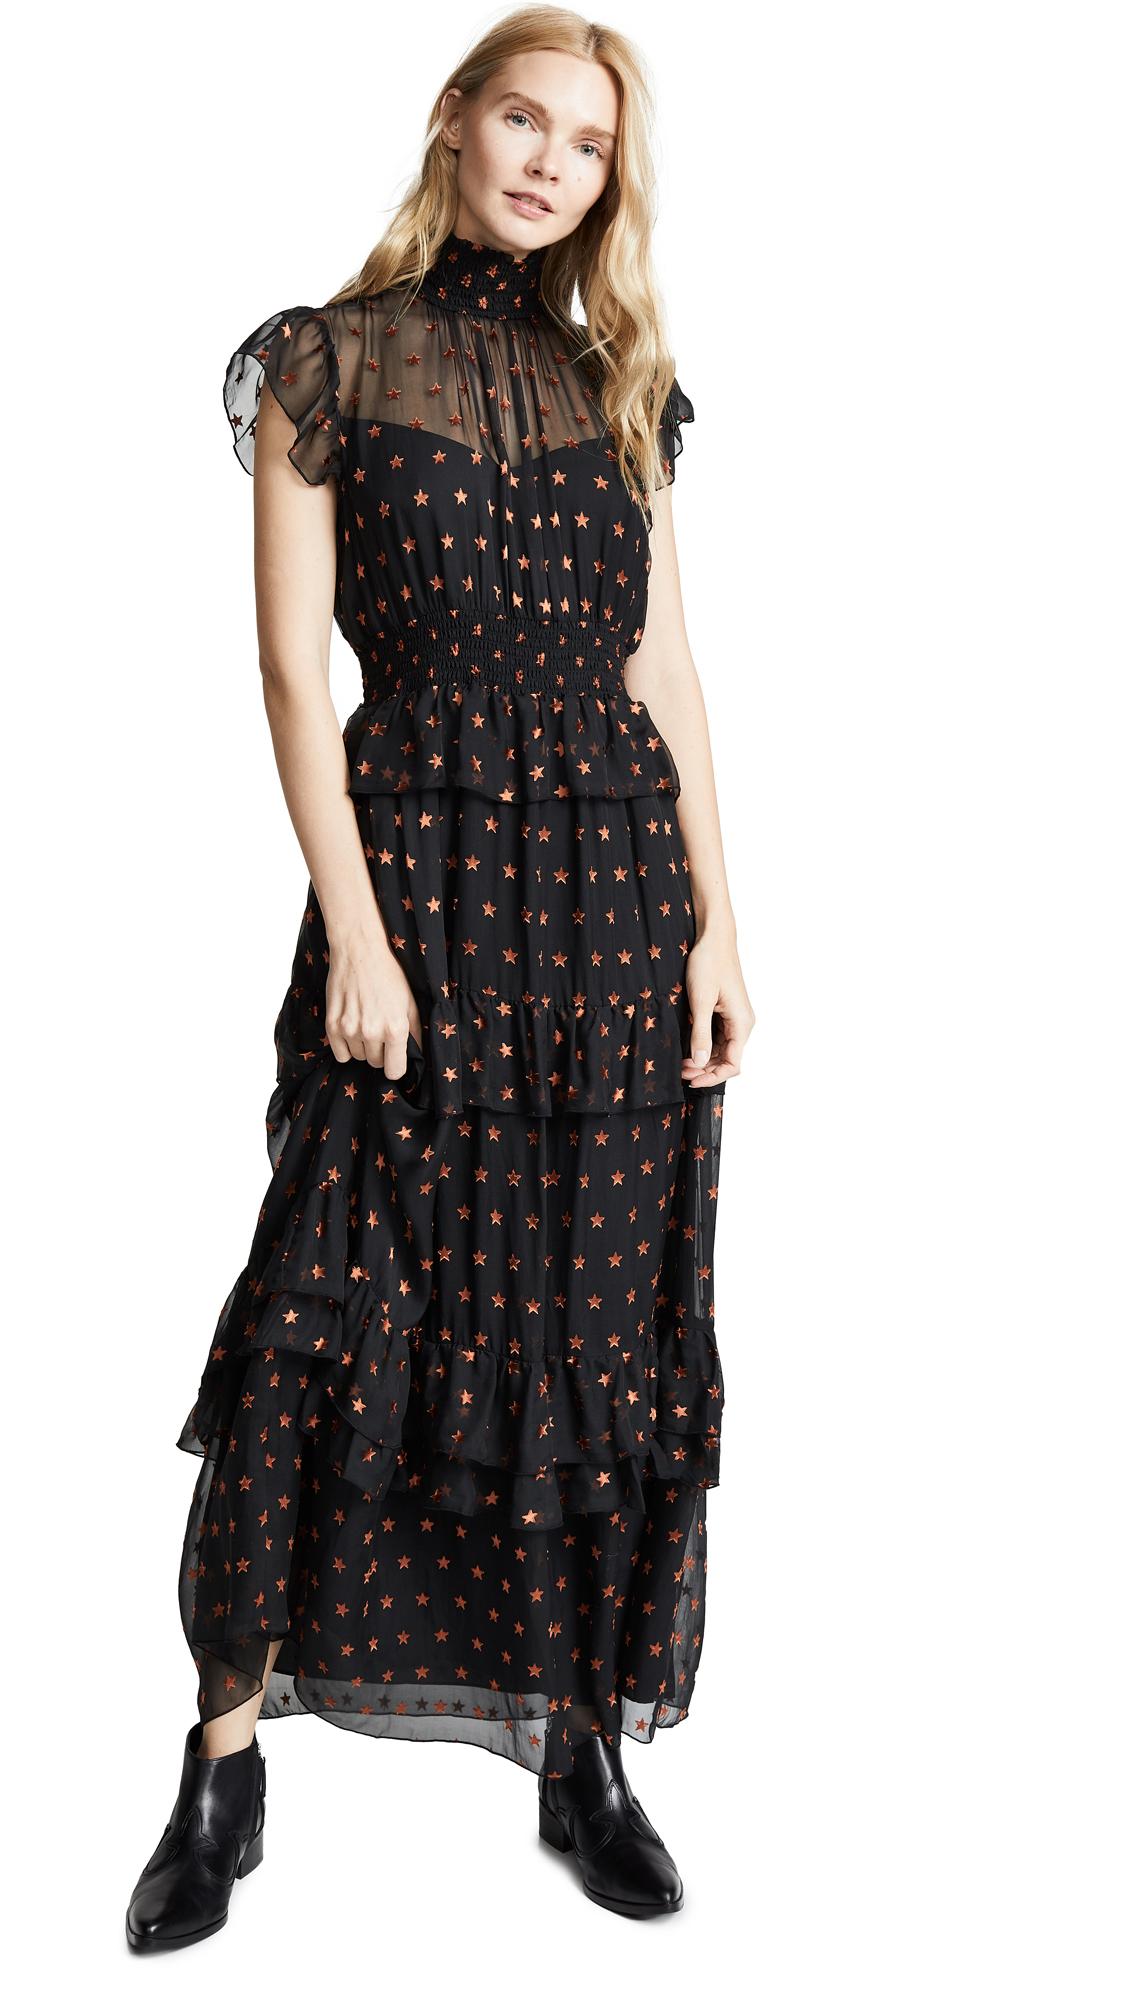 SCOTCH & SODA/MAISON SCOTCH High Neck Maxi Dress in Combo S